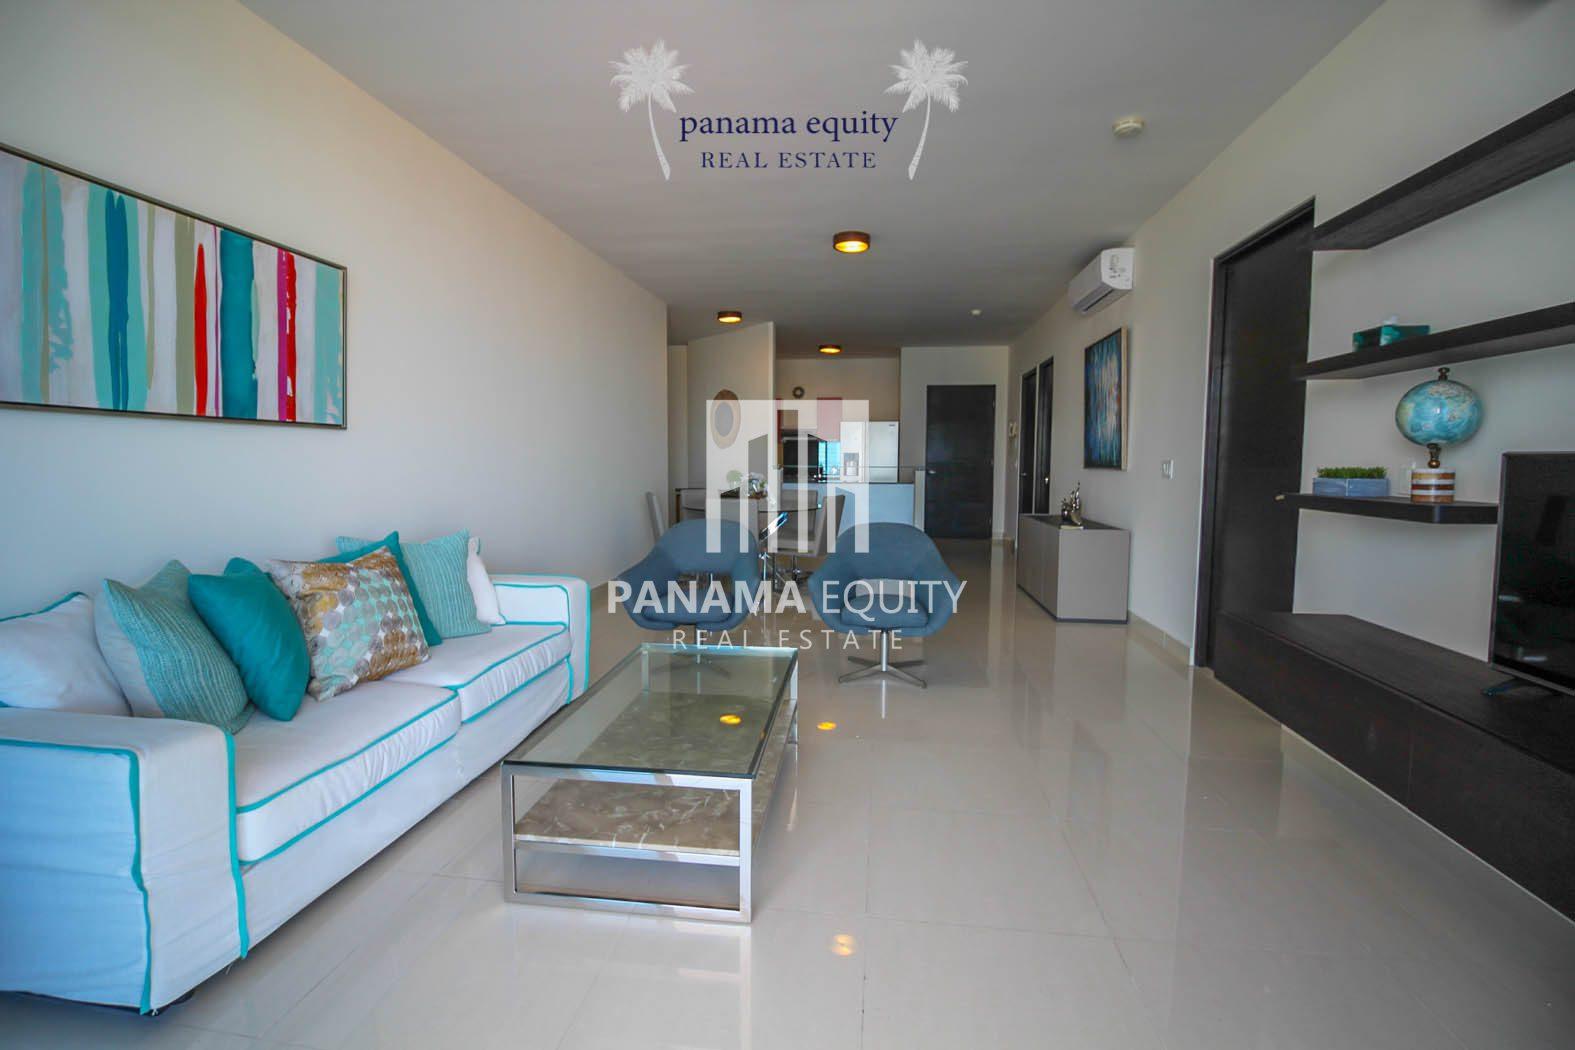 2-Bed Avenida Balboa Apartment With Amazing Views